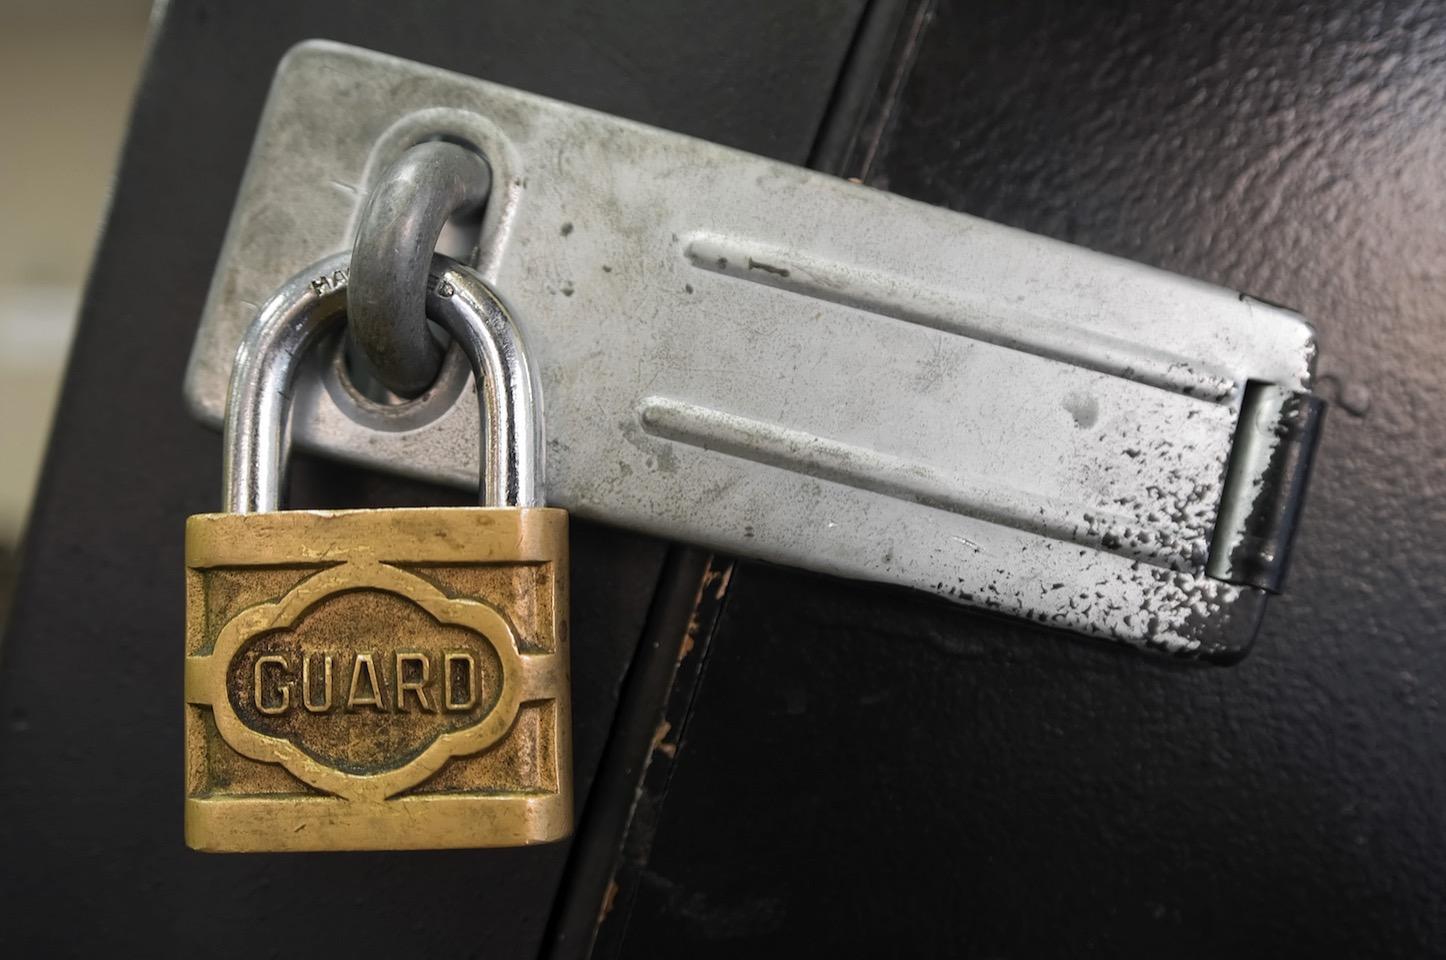 Security guard lock